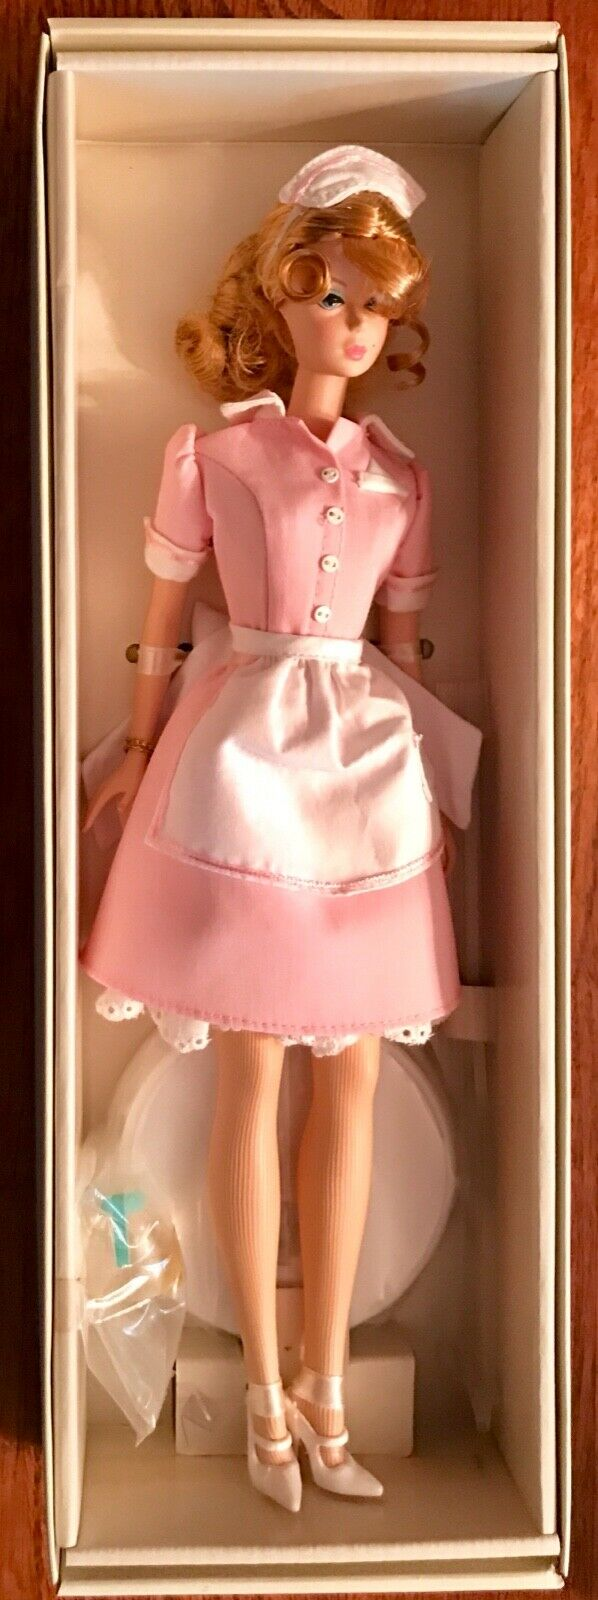 Barbie Silkstone  la camarera oro Label 2005  J8763 nunca quitado de la caja